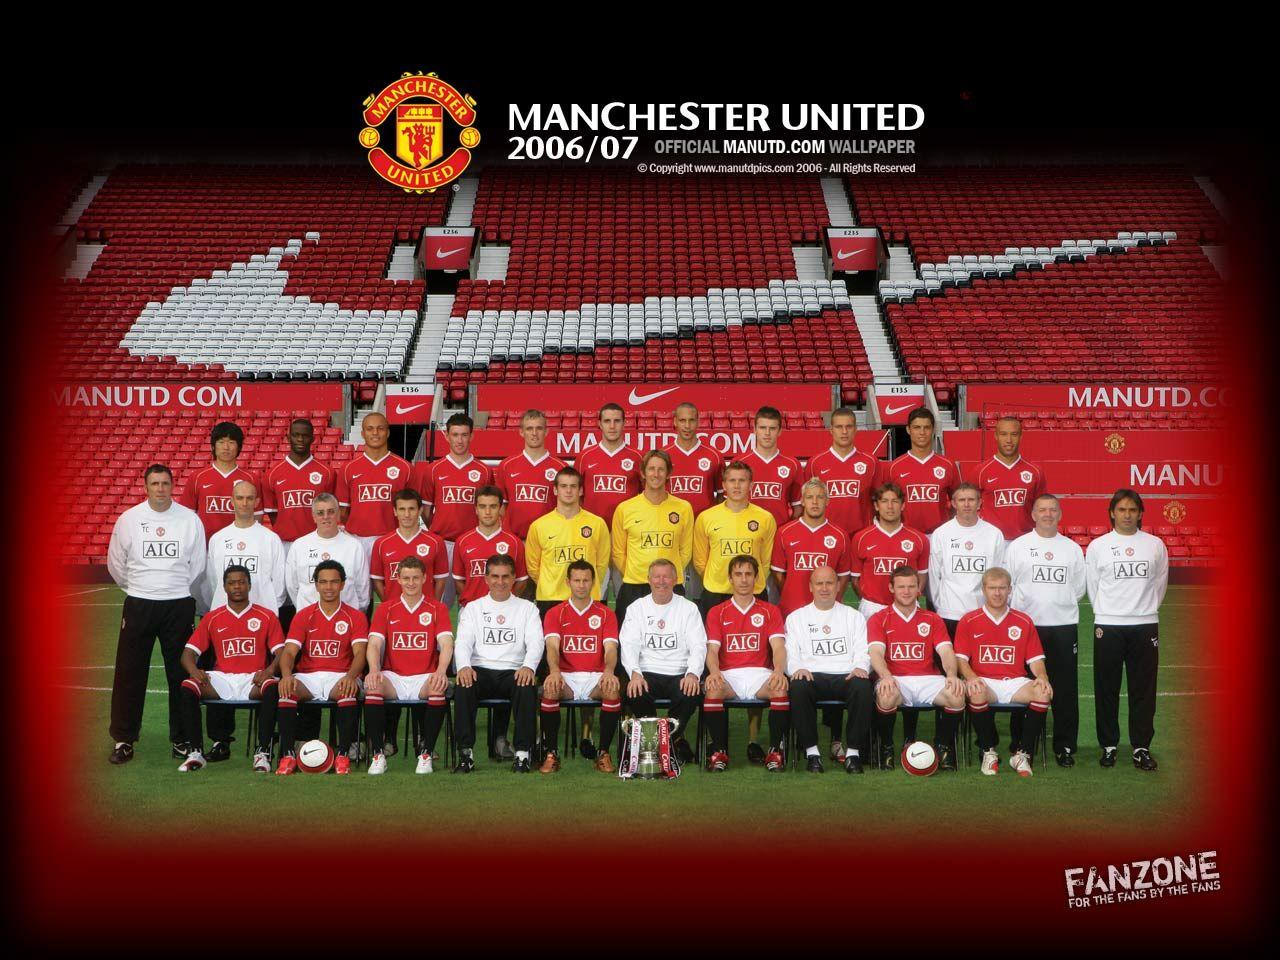 http://2.bp.blogspot.com/-vxg5KYGkbg4/TlFKGYC7XWI/AAAAAAAAICA/pMwrrN0ls_w/s1600/Manchester_United_TEAM.jpg